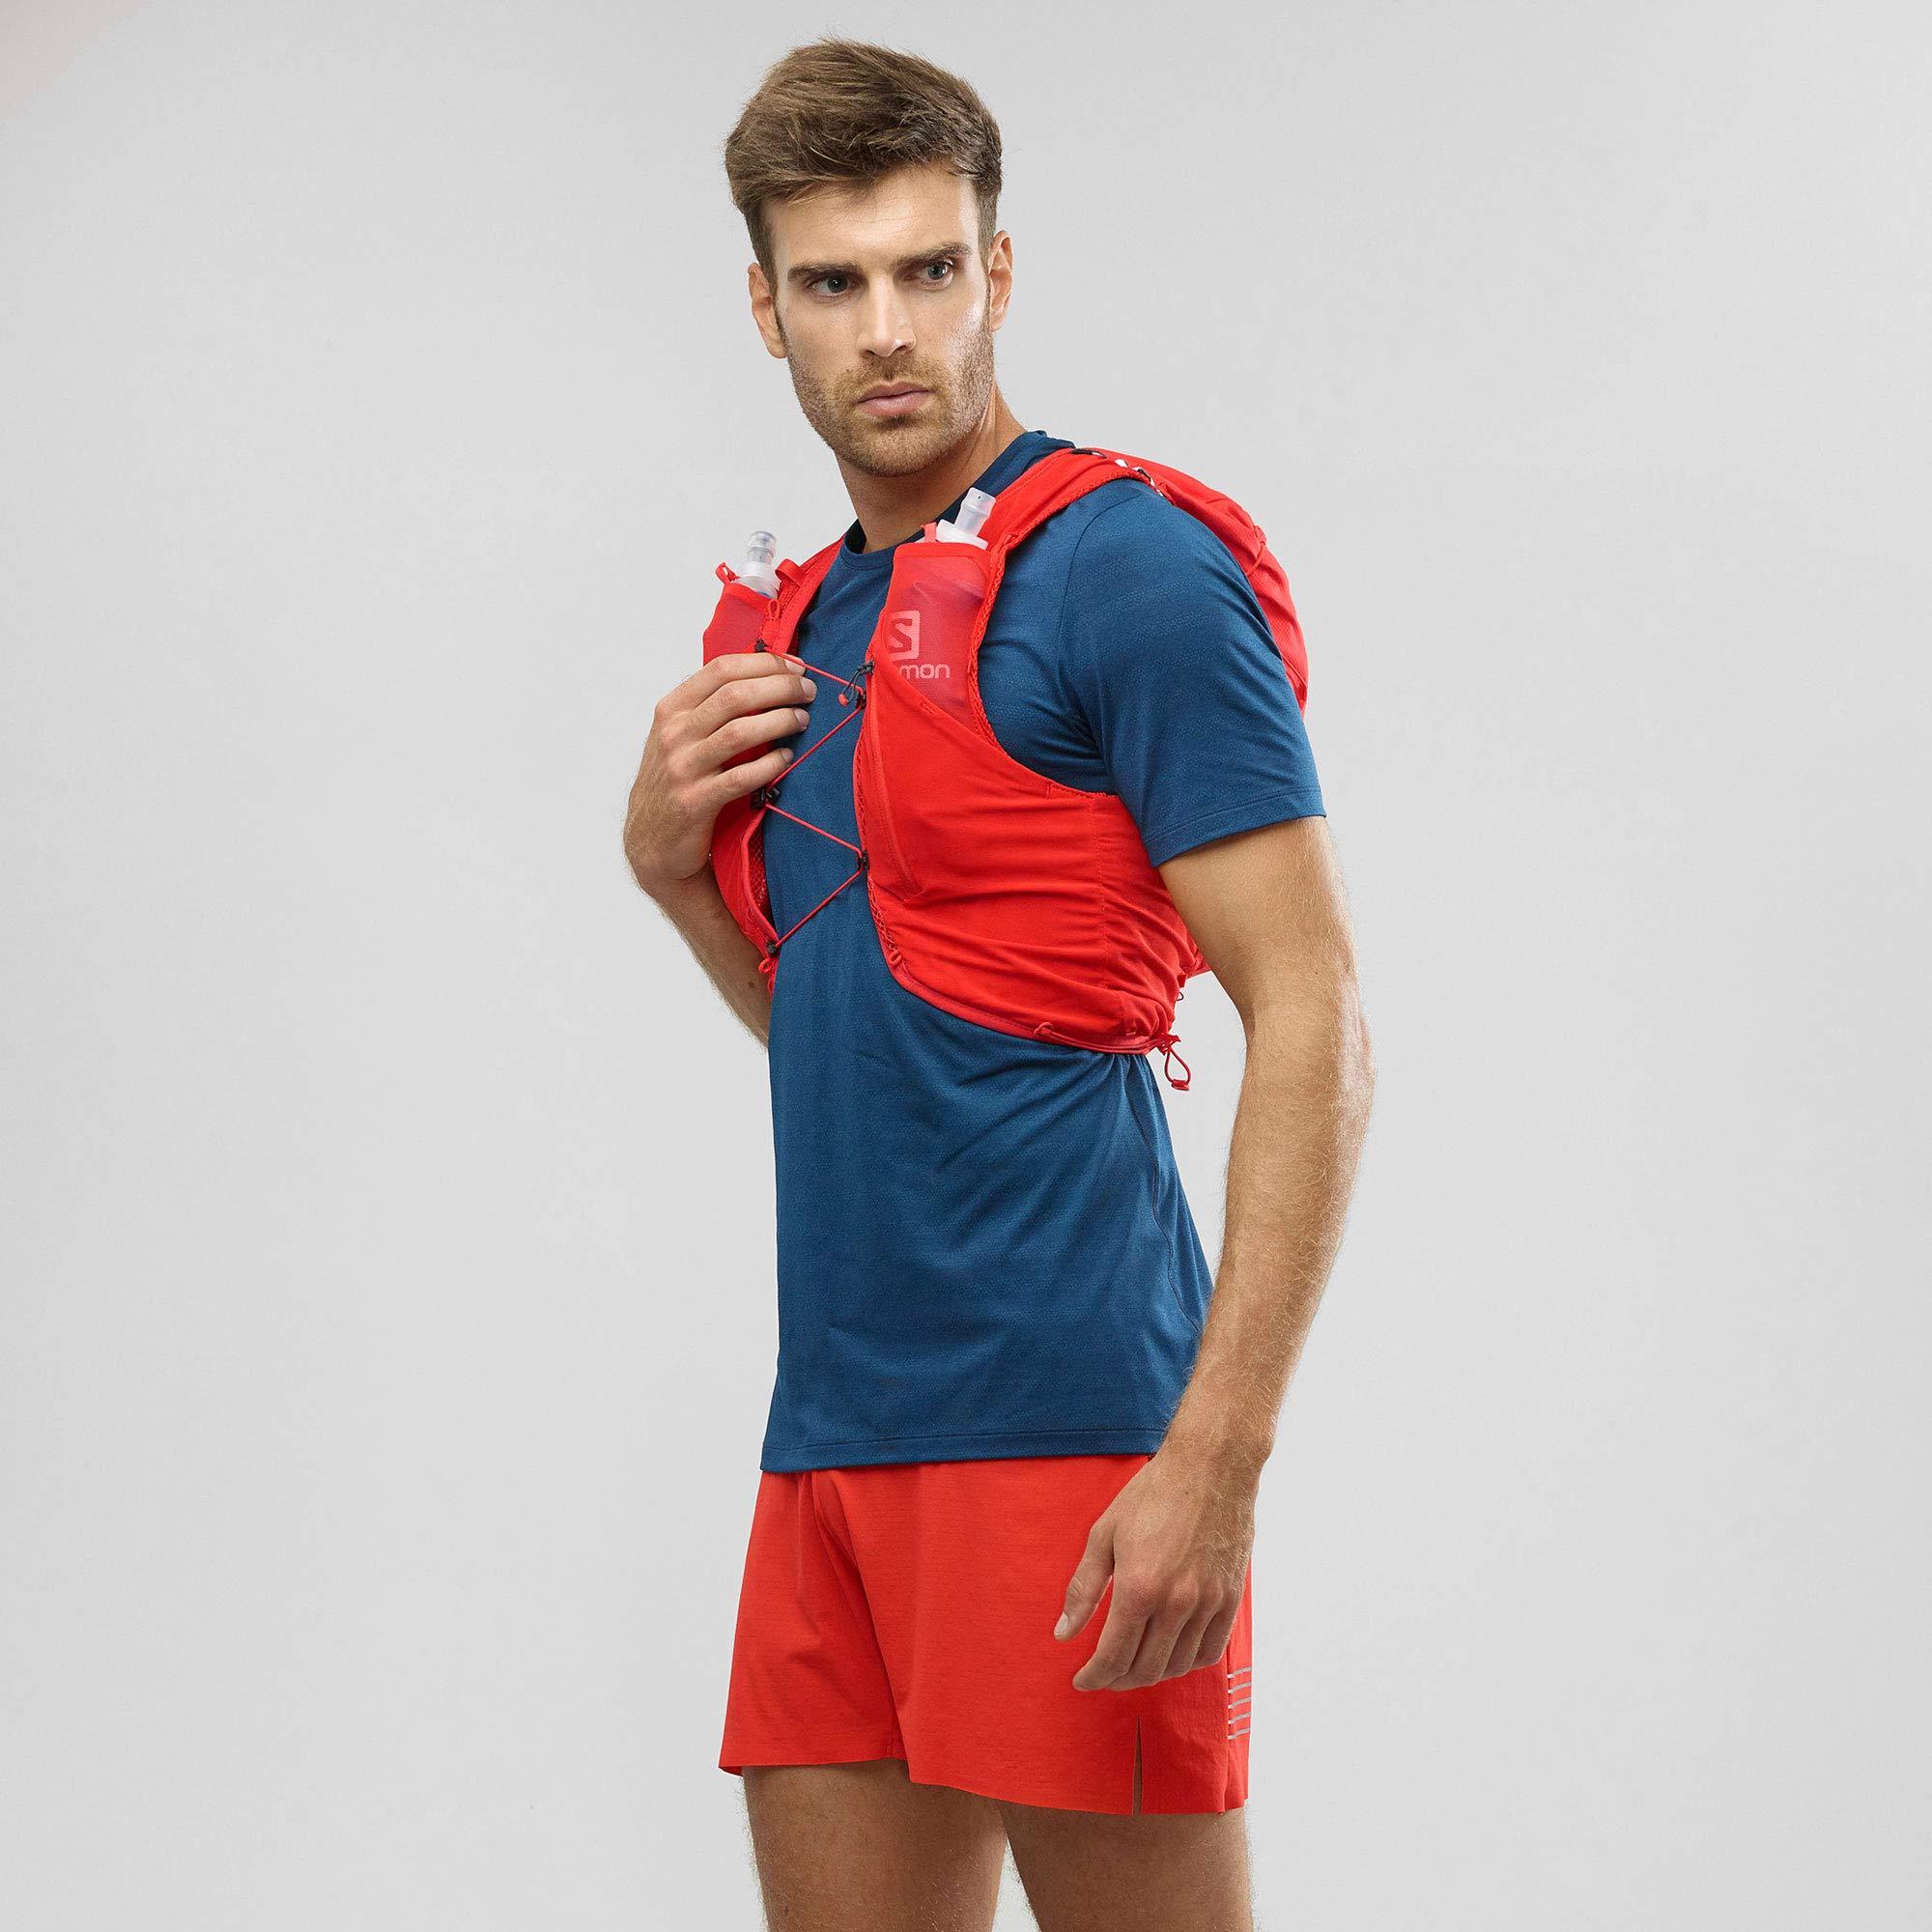 Salomon Mens Advanced Skin 12 Set Running Vest, Fiery Red, X-Large by Salomon (Image #2)